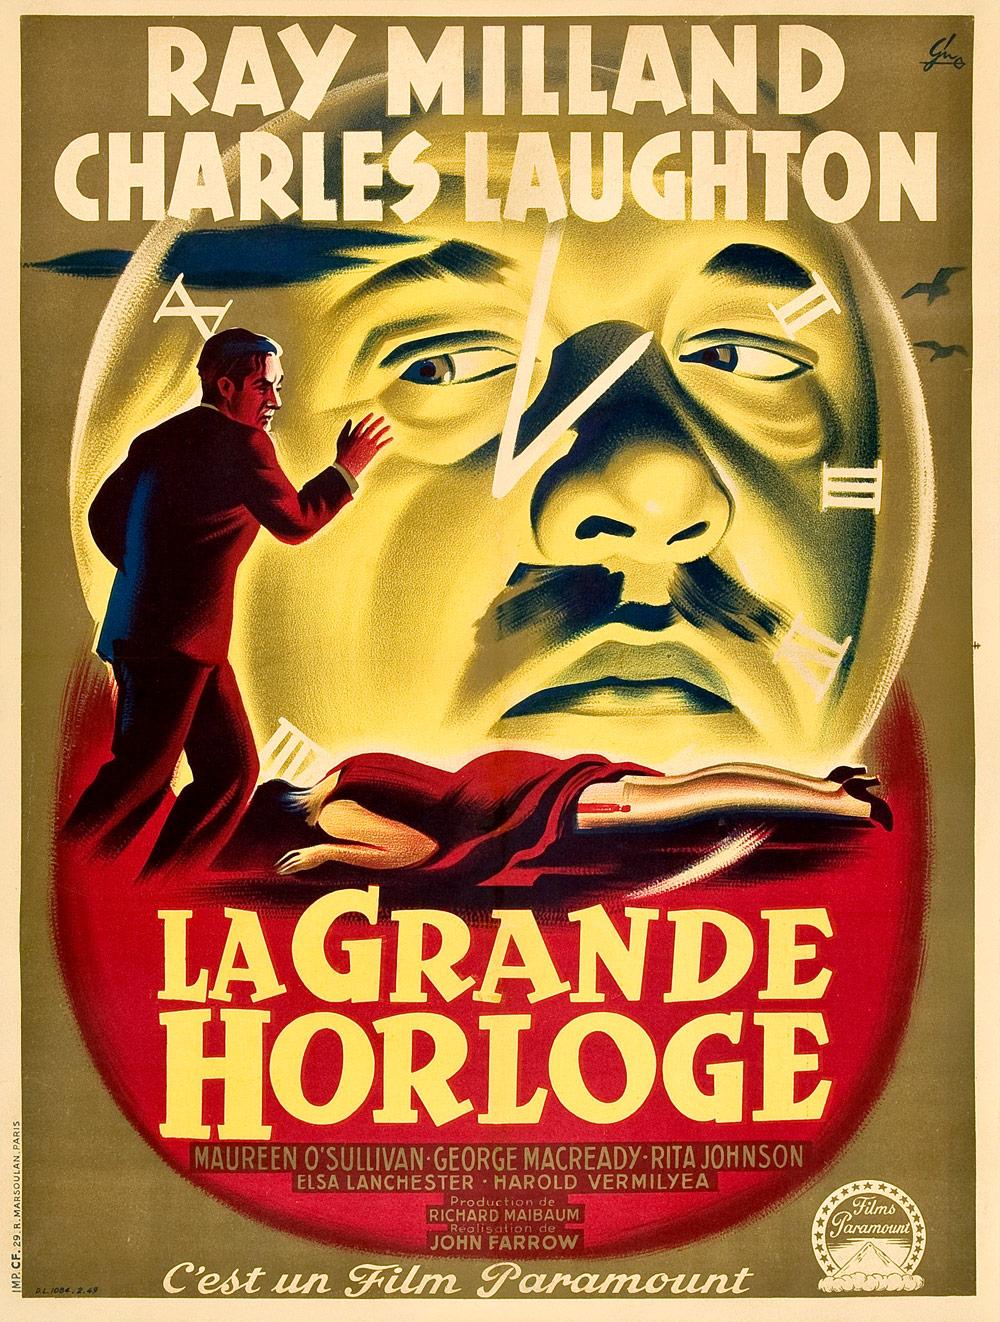 http://2.bp.blogspot.com/-H5GEOimPTkE/TuZk8iAZh4I/AAAAAAAABYs/W1xl2cNeZRI/s1600/Big-Clock-French.jpg